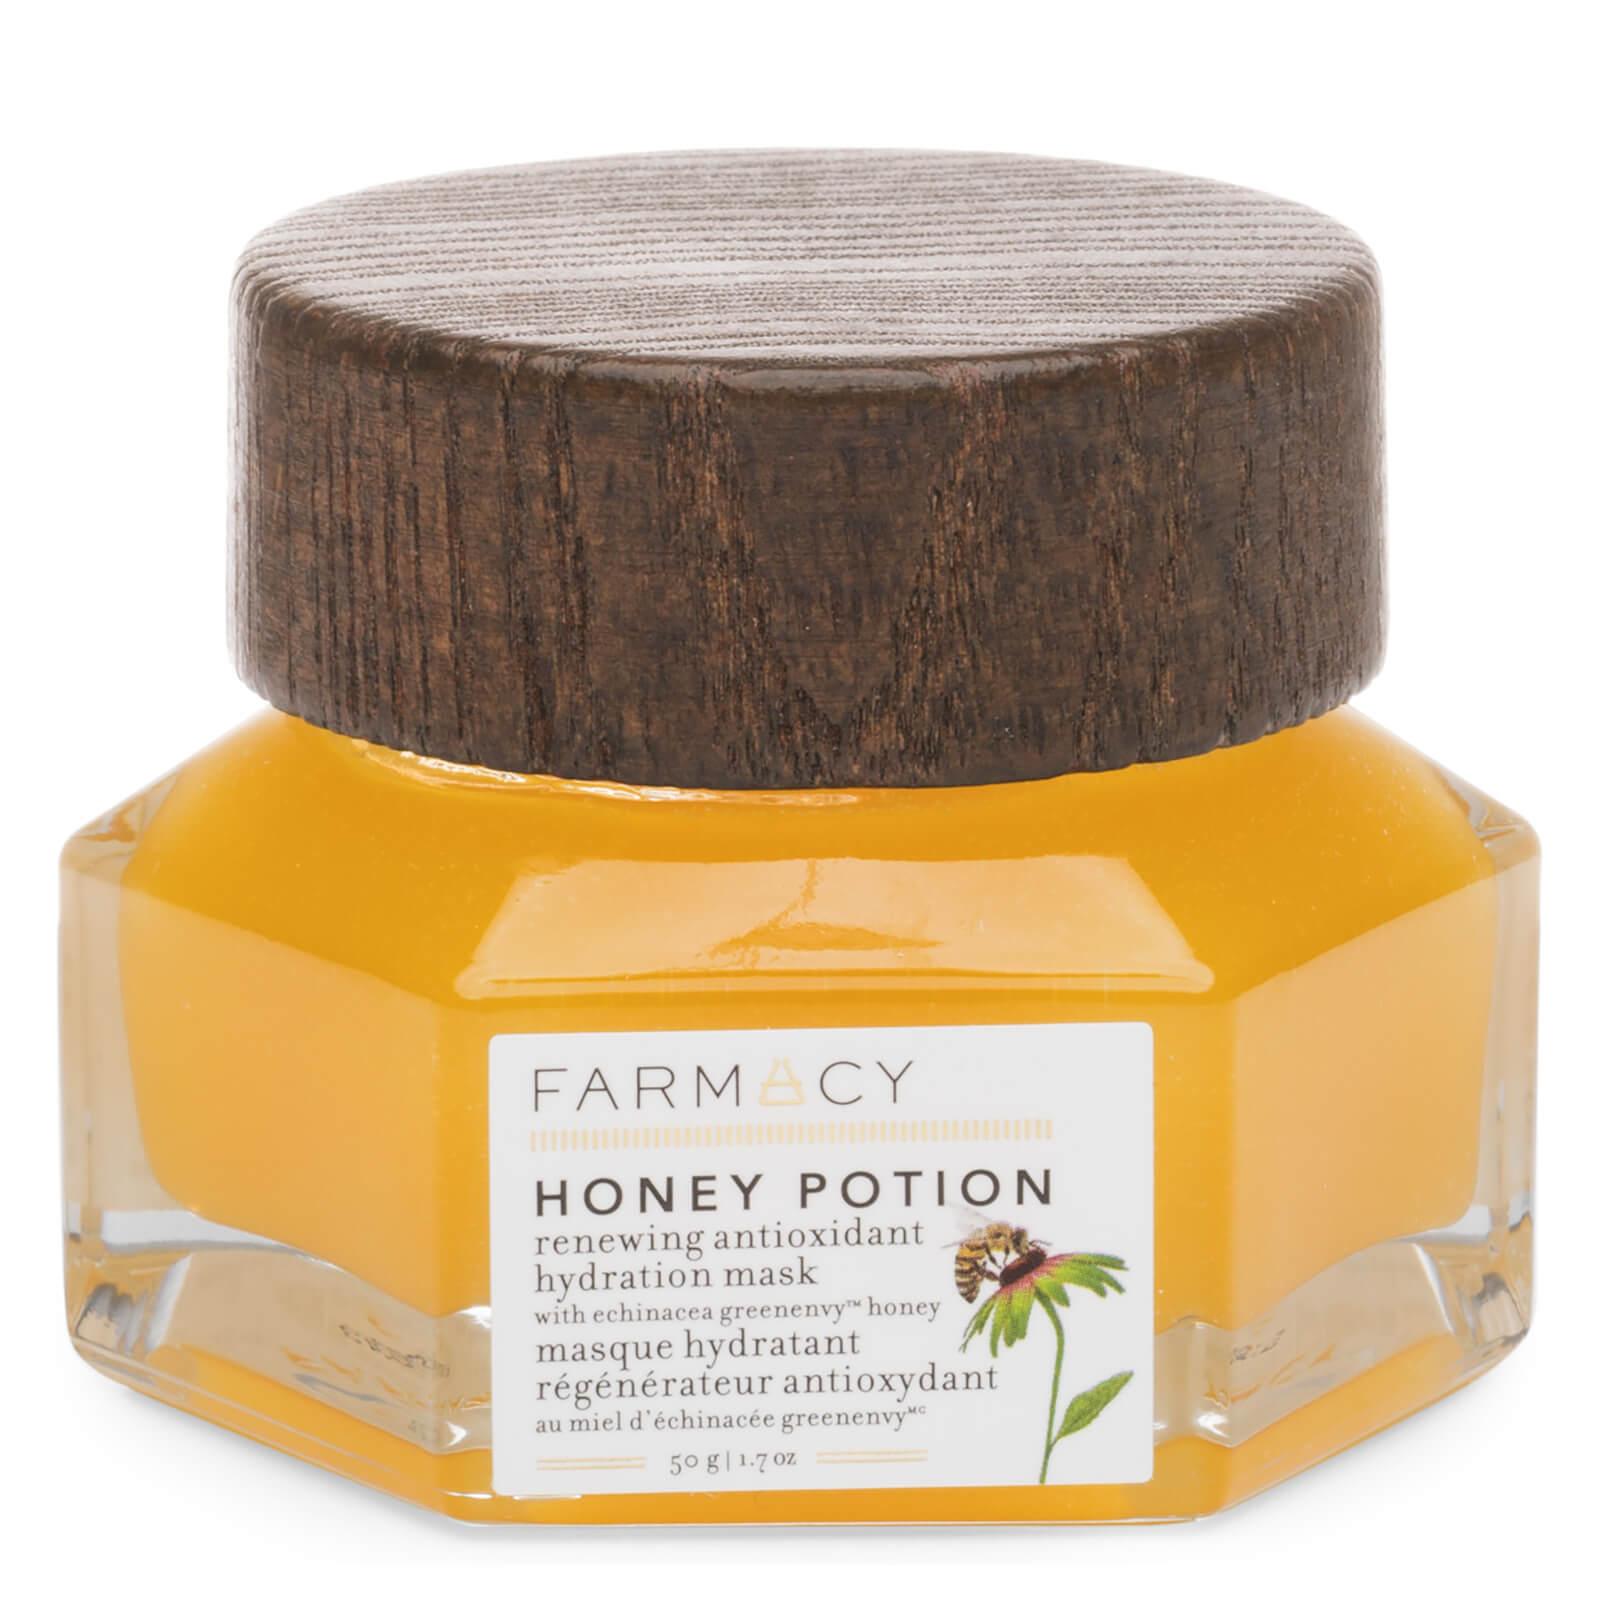 Lookfantastic:FARMACY 蜂蜜面膜、清爽面霜等单品热卖